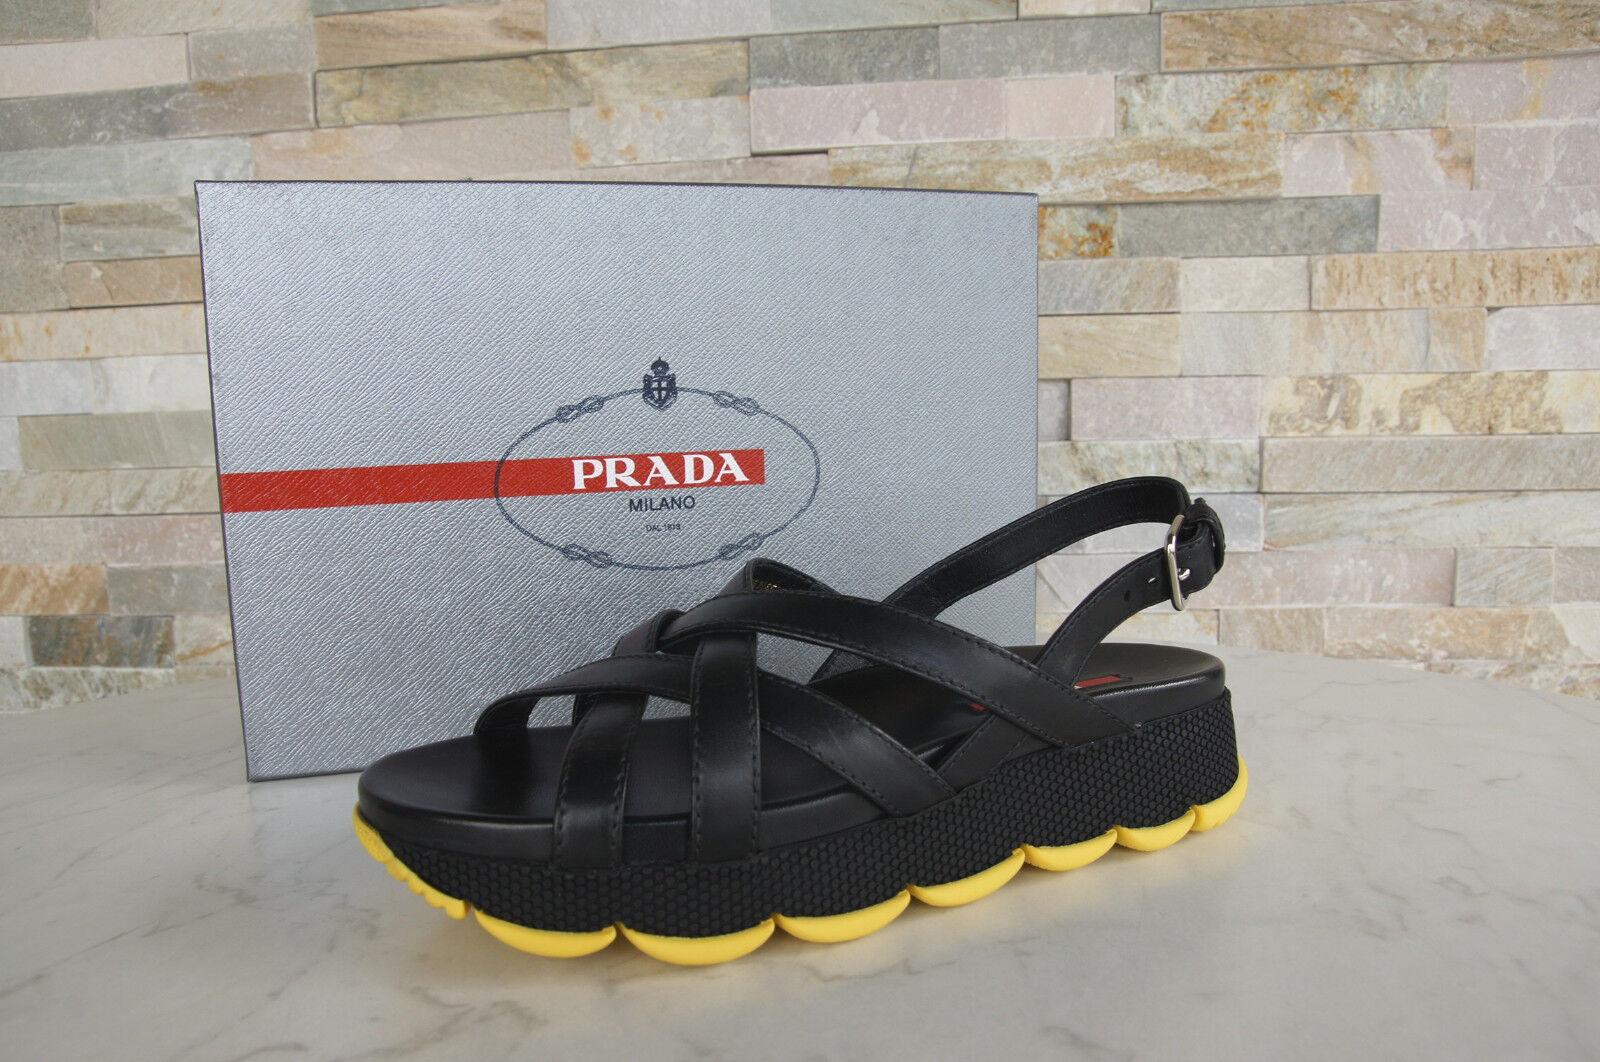 PRADA PRADA PRADA Gr 38 Sandalen Sandales 3X6170 Schuhe schwarz gelb NEU f5e201